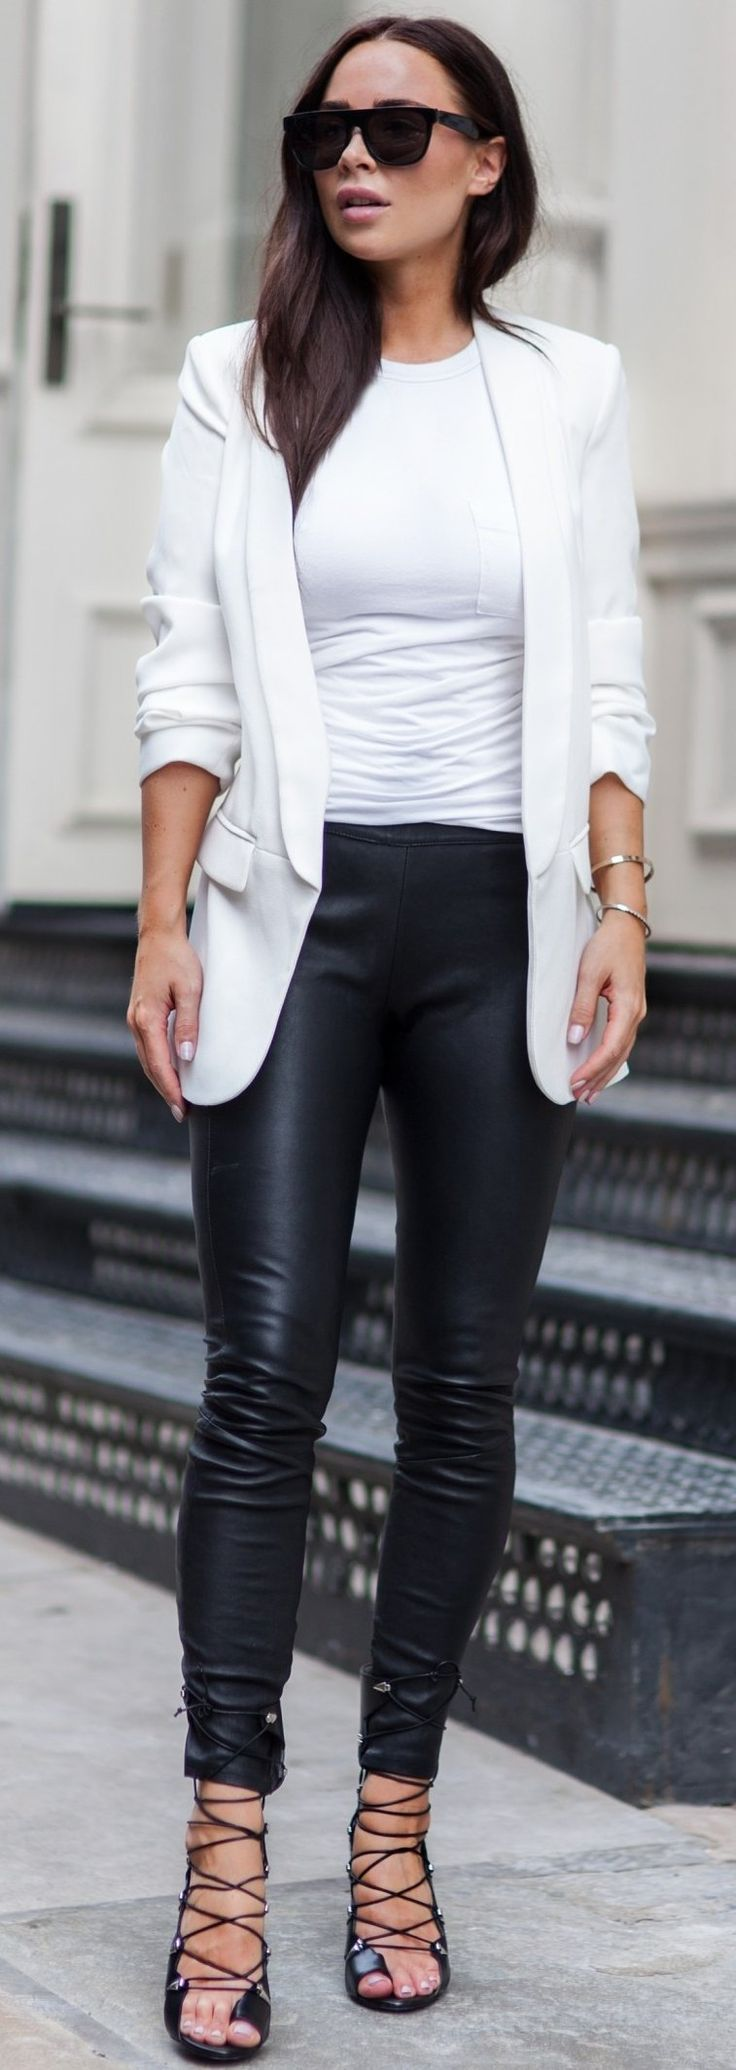 Black + White                                                                             Source